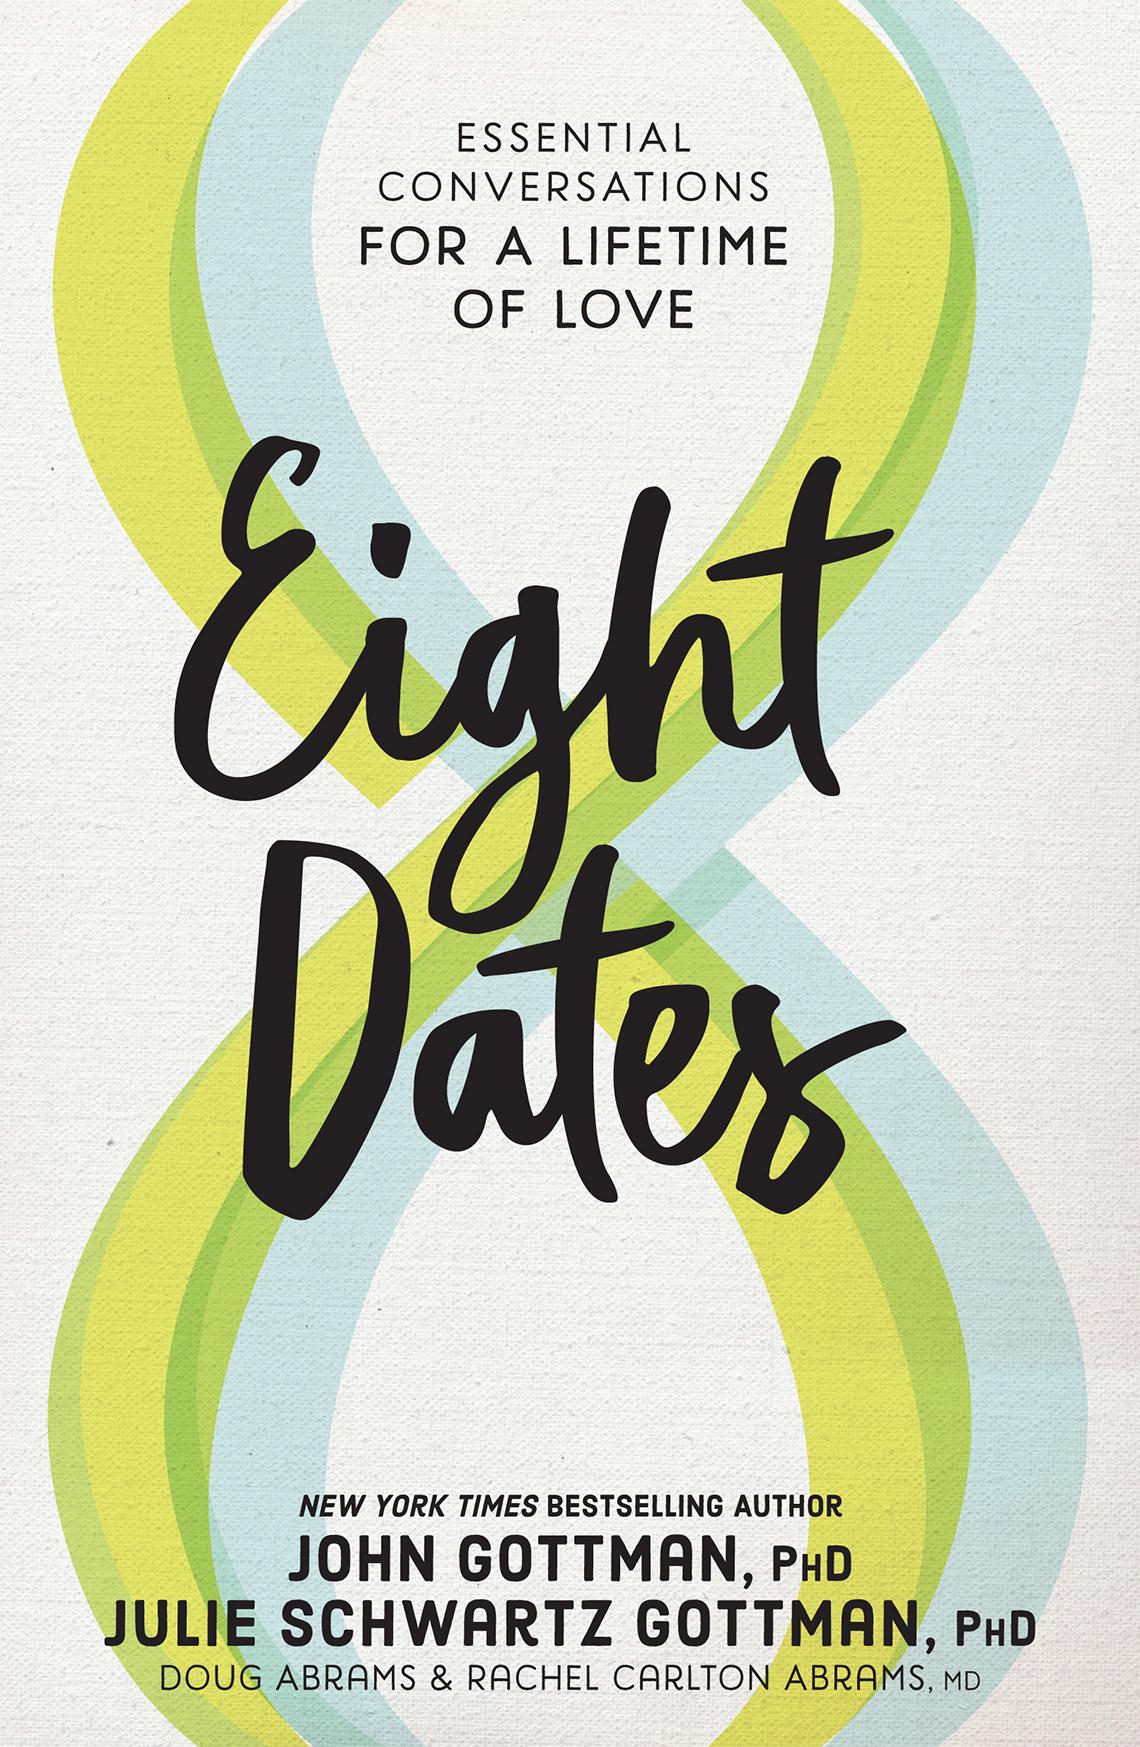 Book cover reads: Essential Conversations for a Lifetime of Love, Eight Dates, John and Julie Gottman, Doug Abrams, Rachel Carlton Abrams